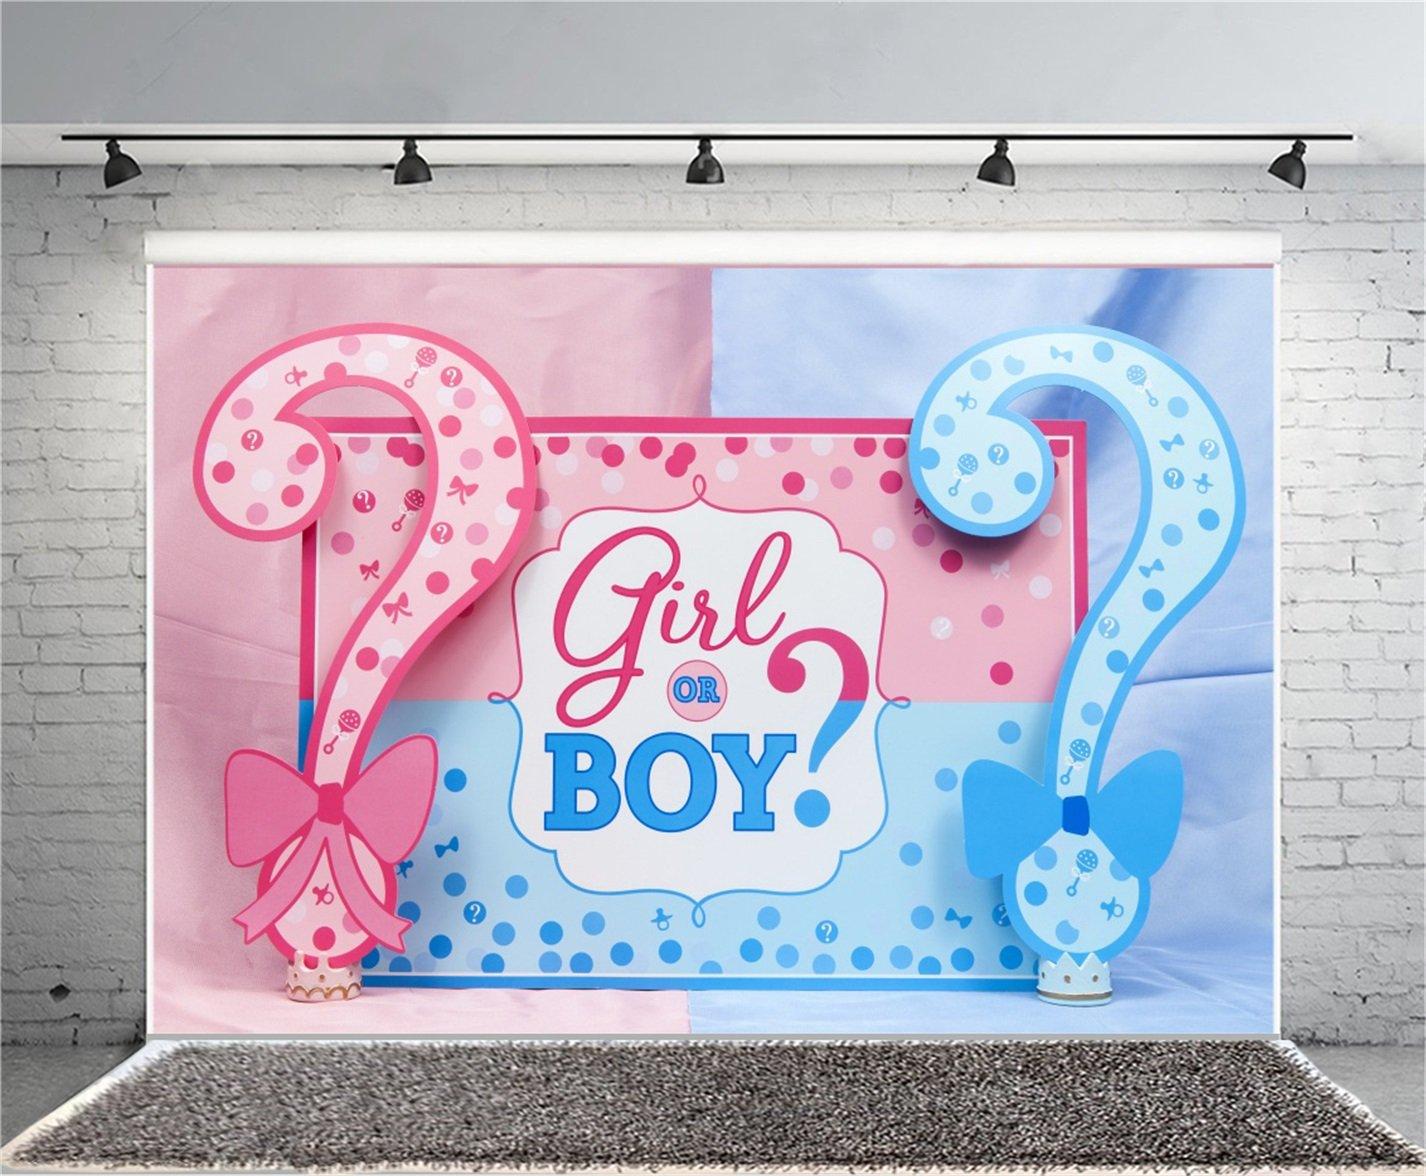 Baby Shower Backdrop Girl Or A Boy - HD Wallpaper